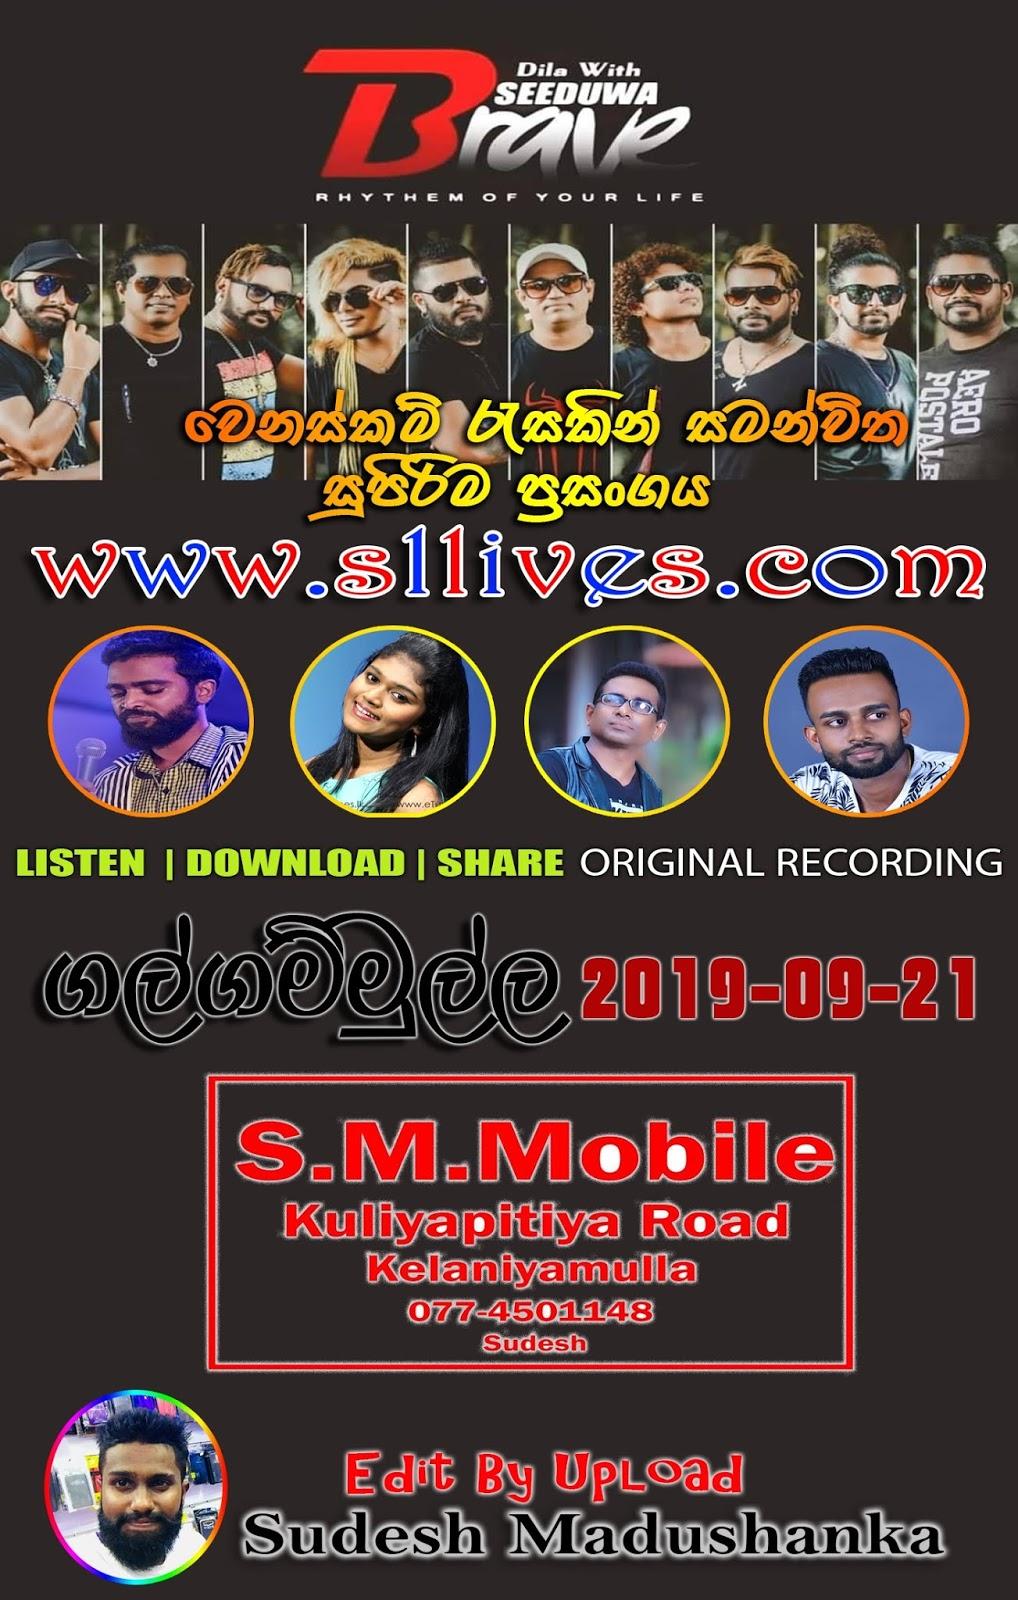 SEEDUWA BRAVE LIVE IN GALGAMMULLA 2019-09-21 - Www Sllives Com